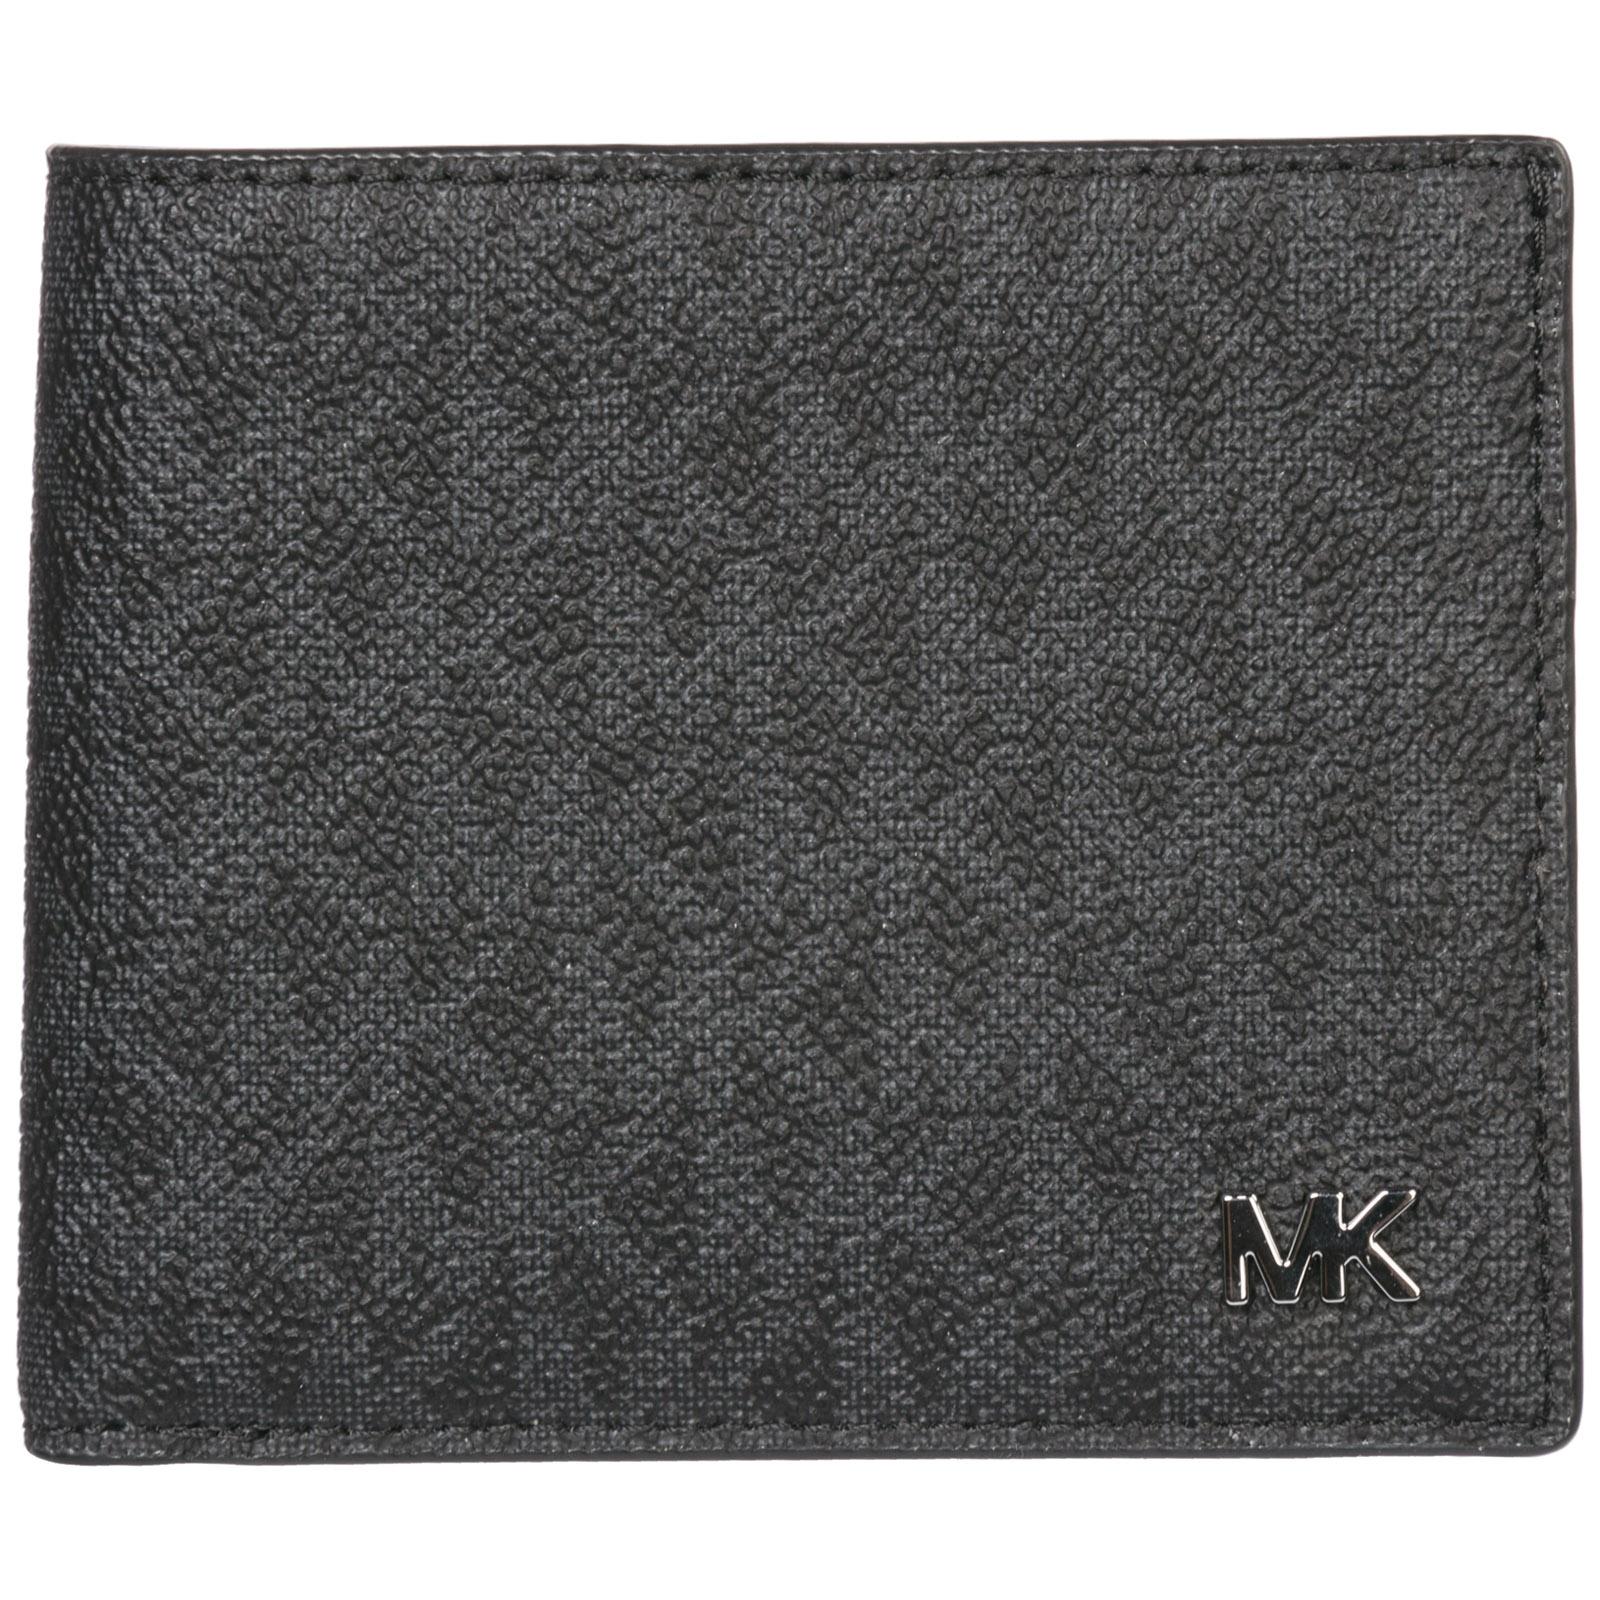 08db0247edbd Michael Kors Men s genuine leather wallet credit card bifold jet set